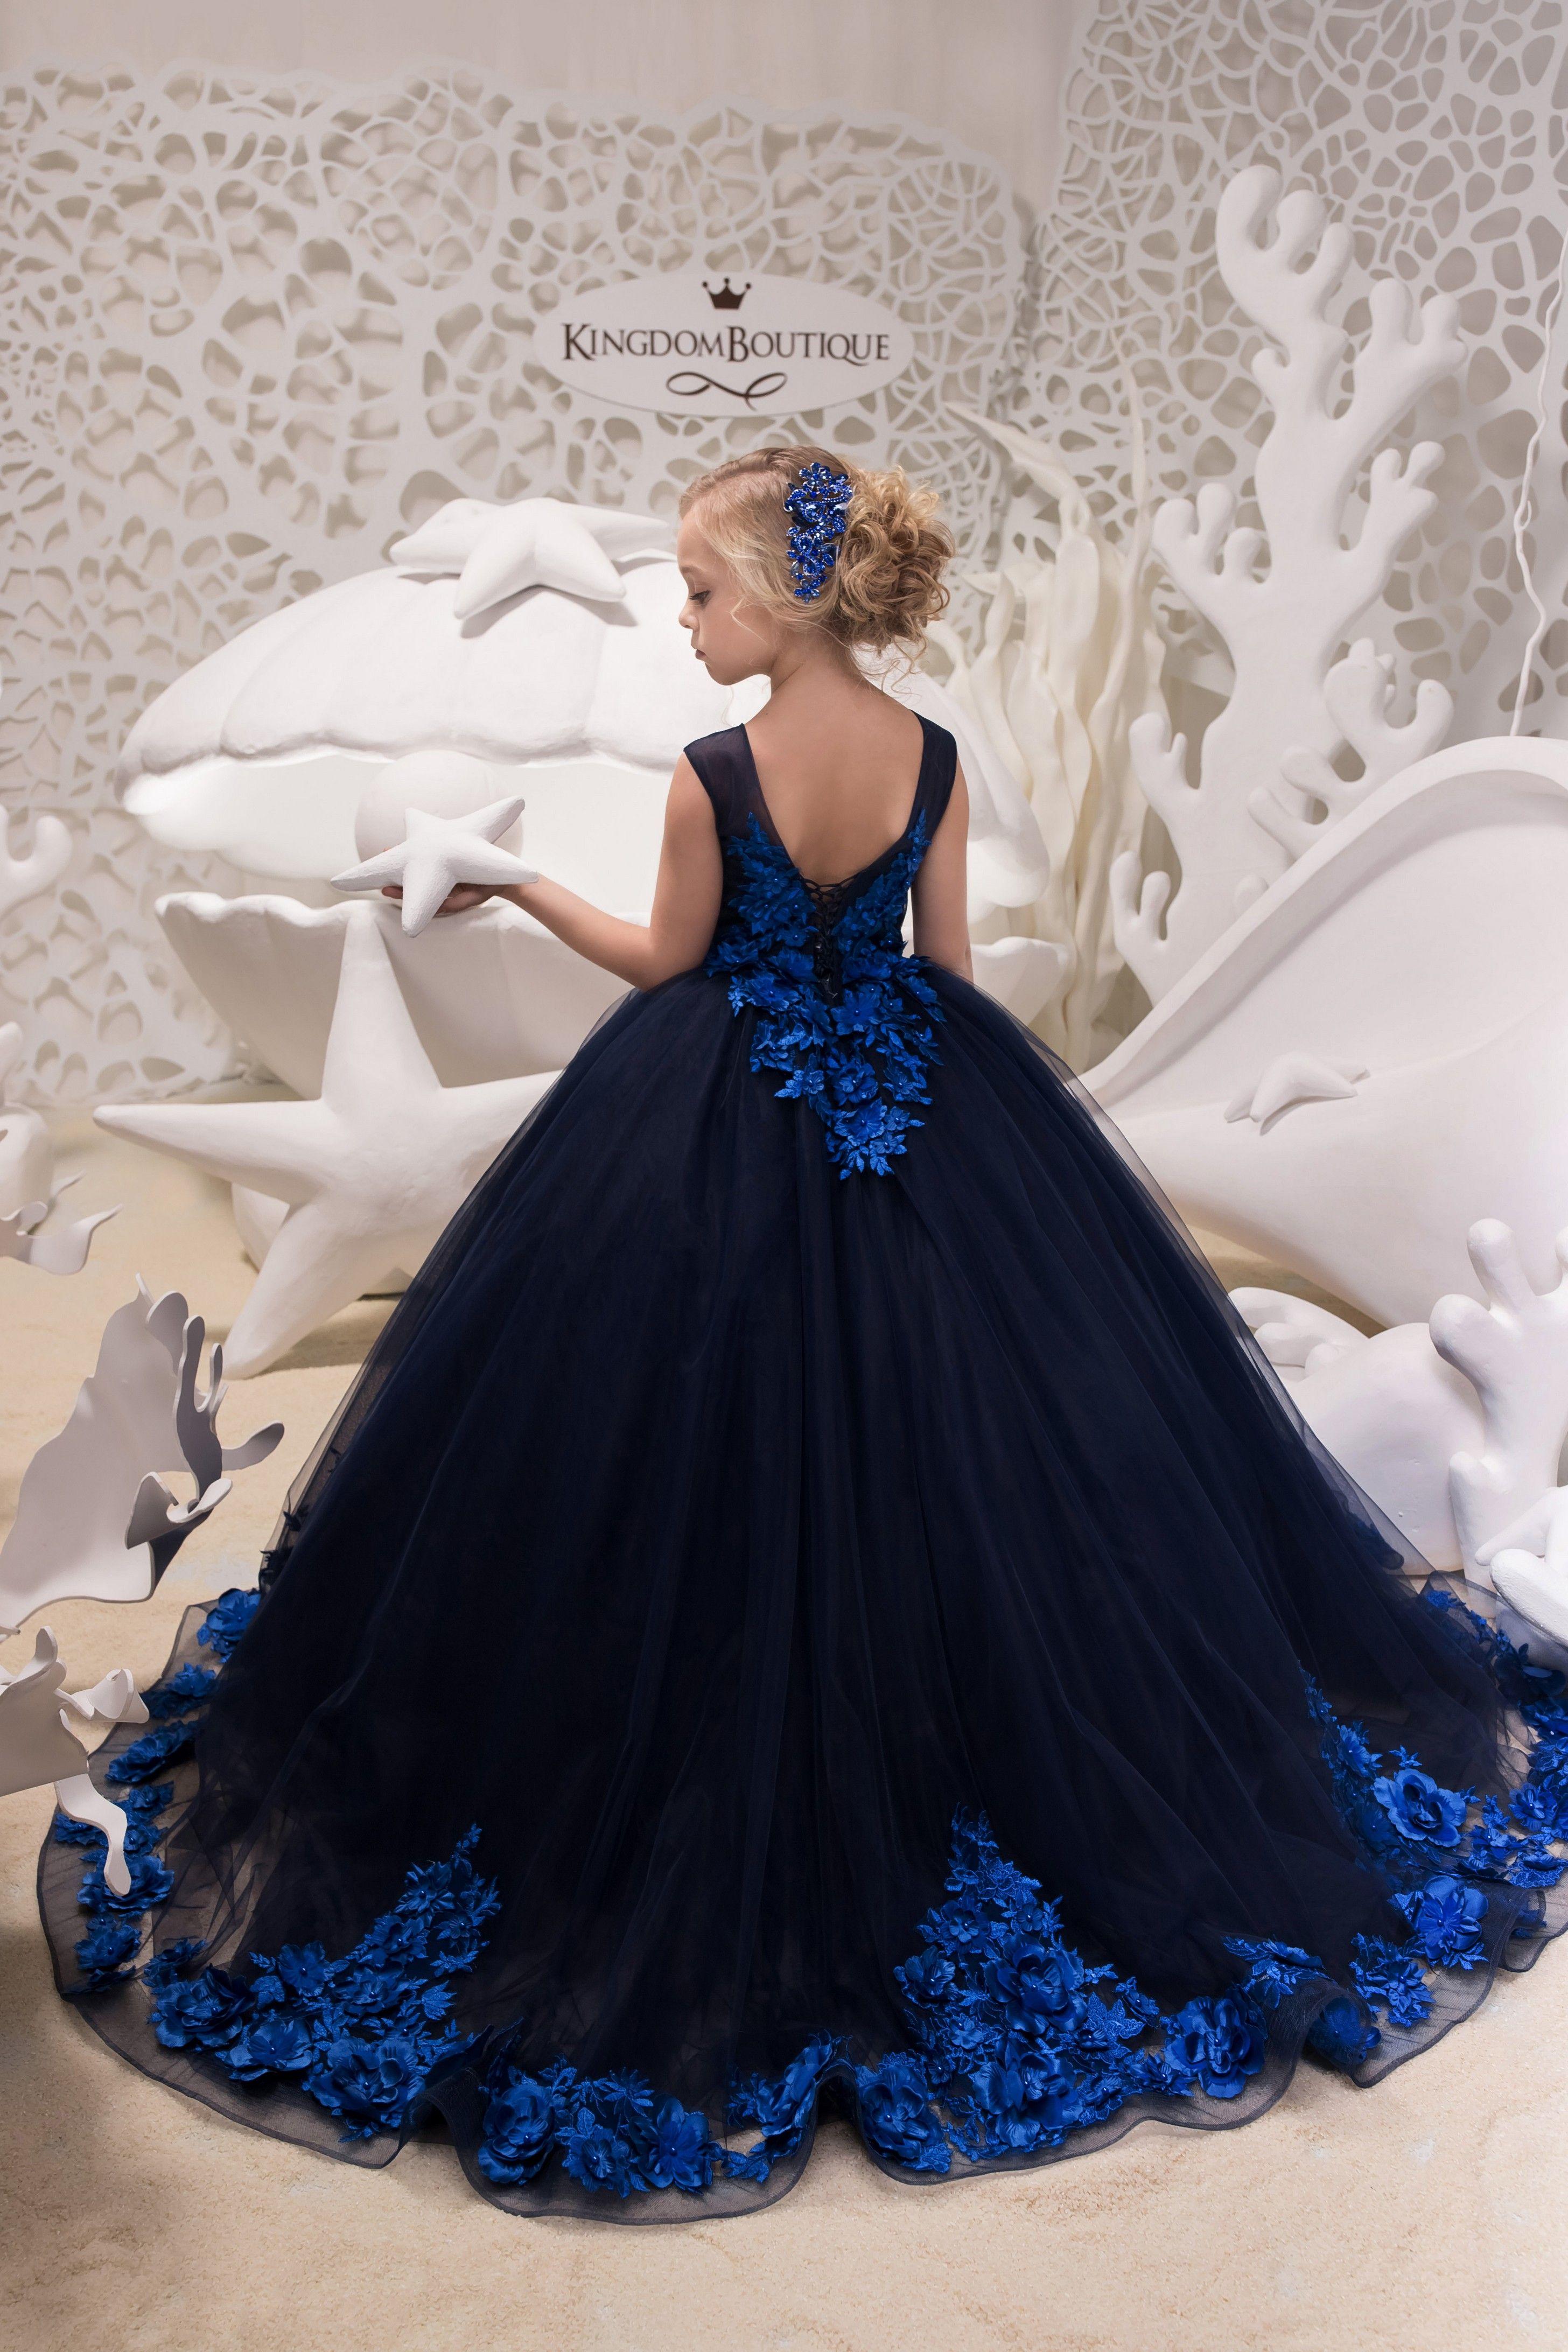 Kingdomboutique flower girl dress 21055 blue tulle